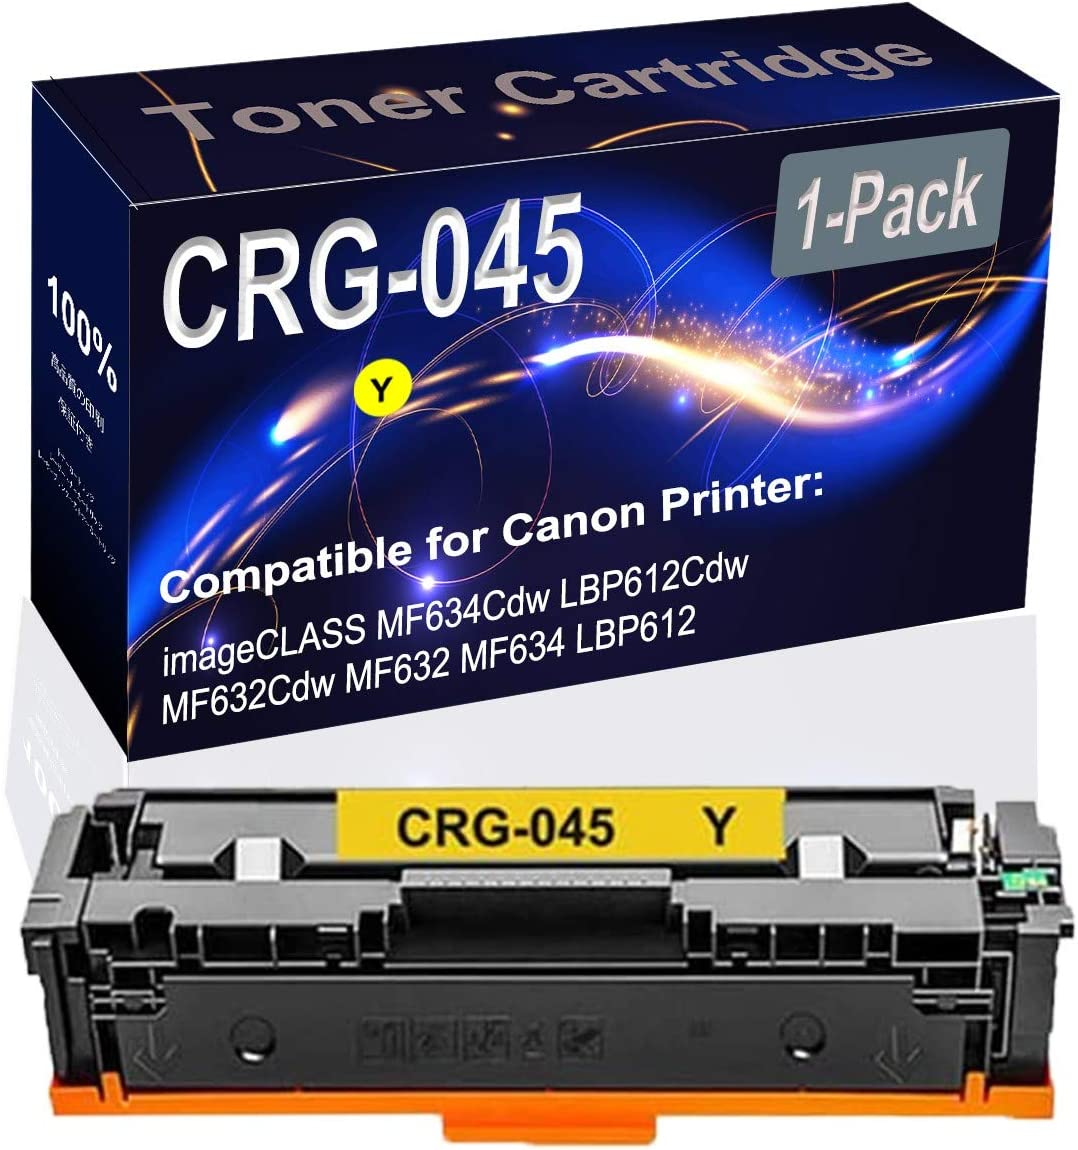 1-Pack (Yellow) Compatible imageCLASS MF634Cdw LBP612Cdw MF632Cdw MF632 MF634 LBP612 Laser Printer Toner Cartridge (High Capacity) Replacement for Canon CRG-045 Printer Toner Cartridge